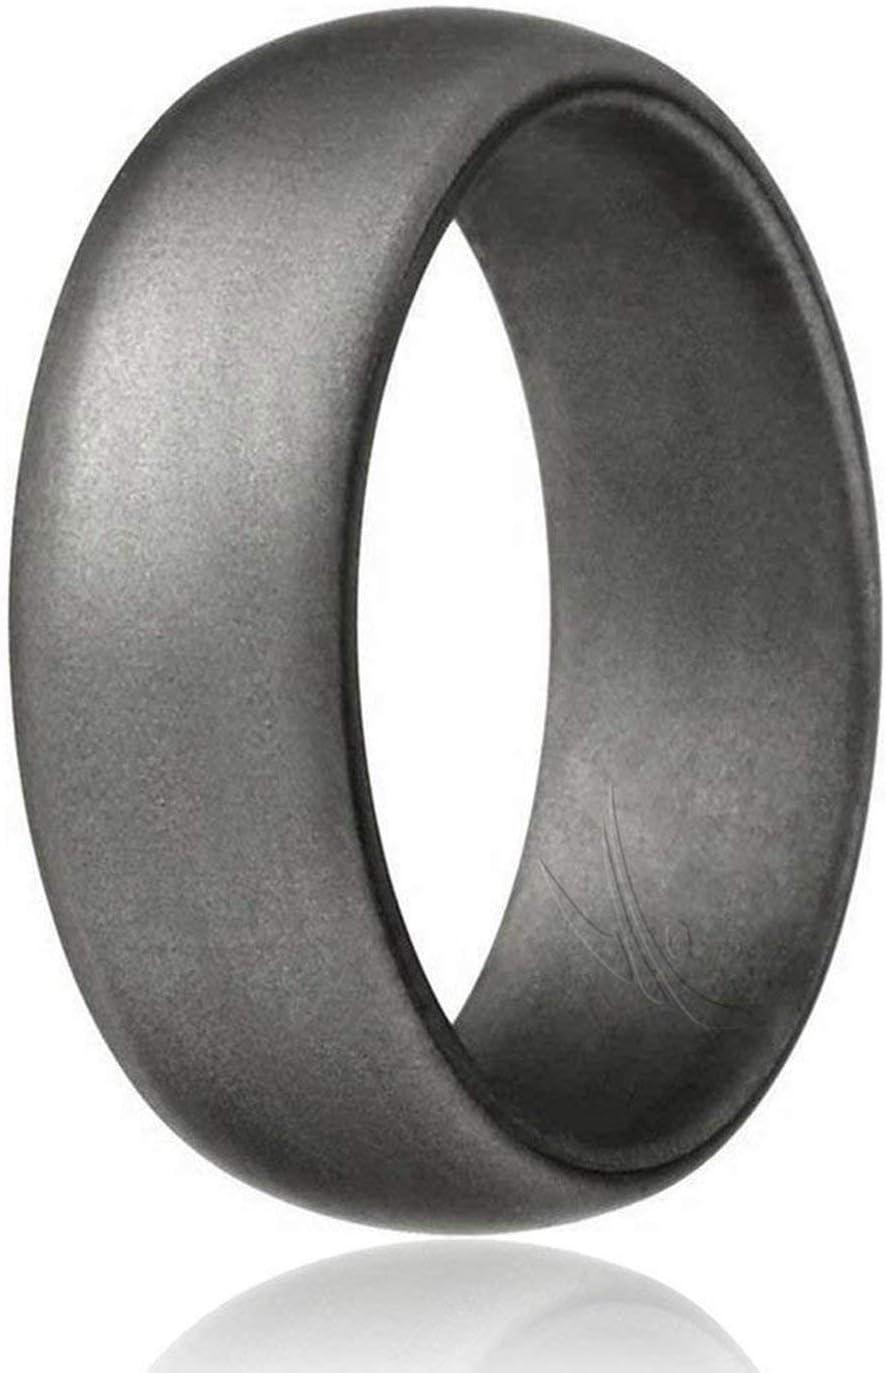 Schwarz Metall Look Silber ROQ Silikon Hochzeit Ring f/ür M/änner G/ünstigen Silikon Gummi Band /Camo 4/Pack /& Singles/ Hellgrau Grau